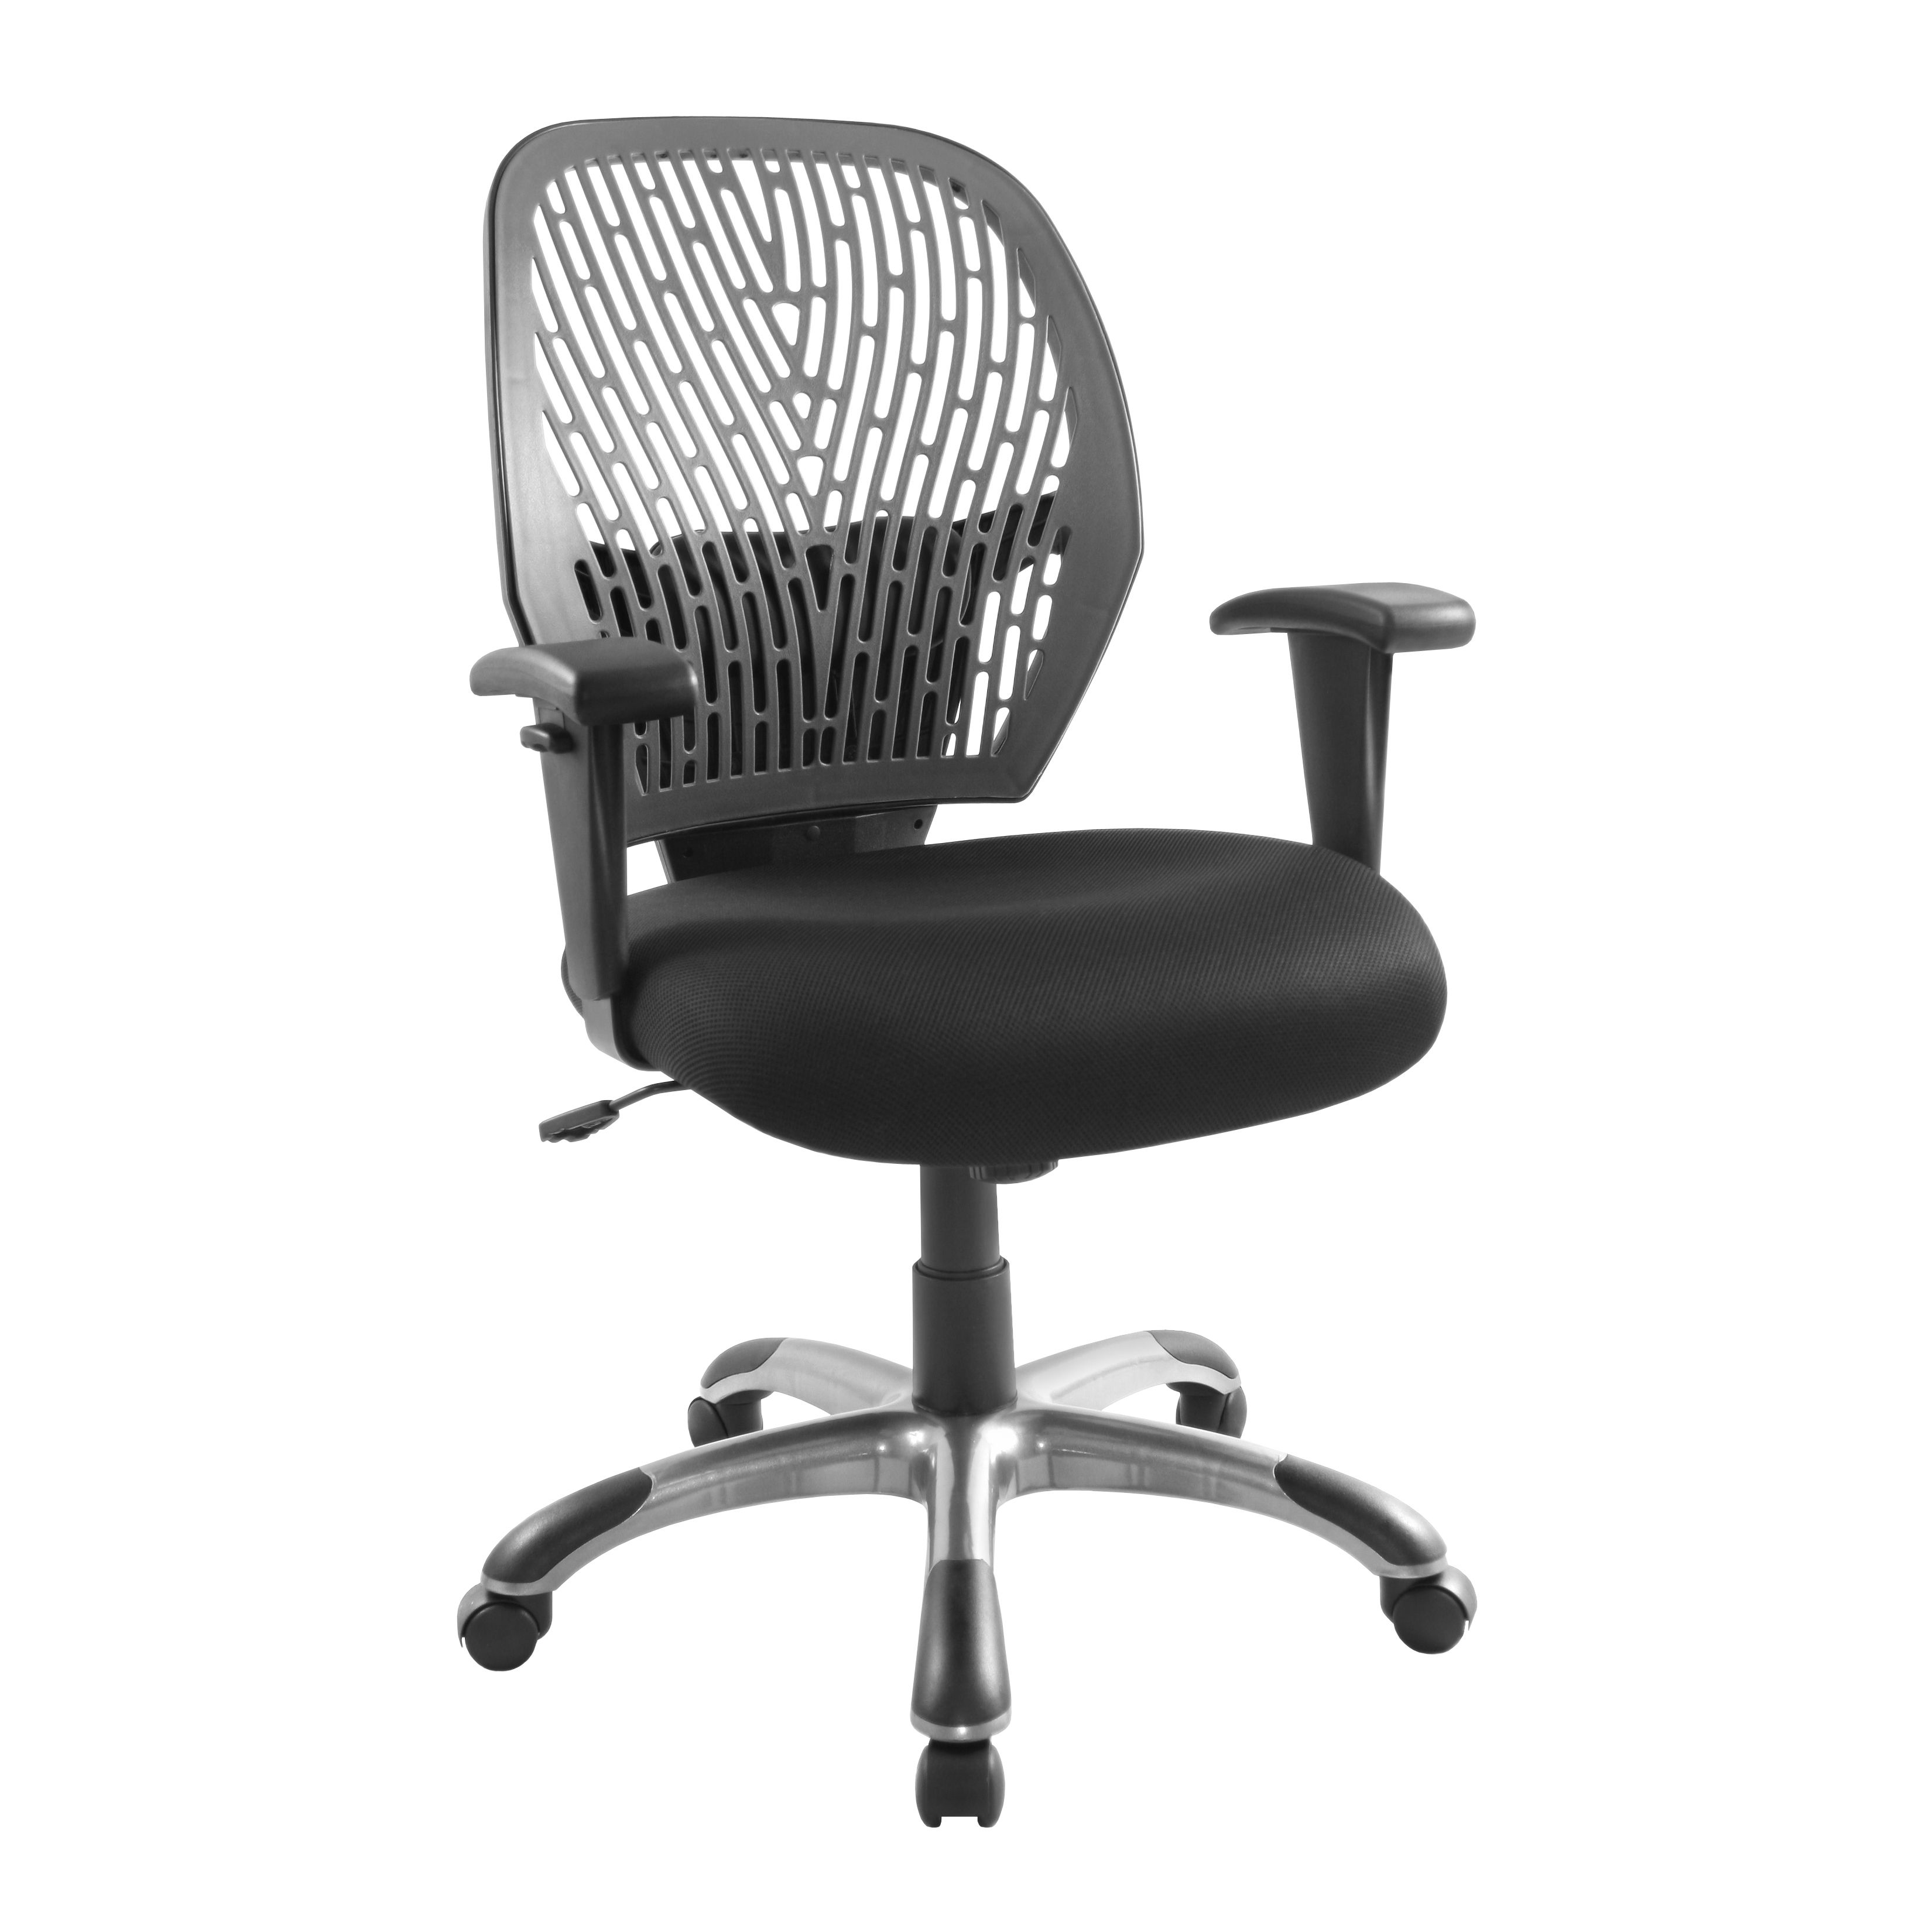 hygena chair details williams product sasha office d shop show action grey j